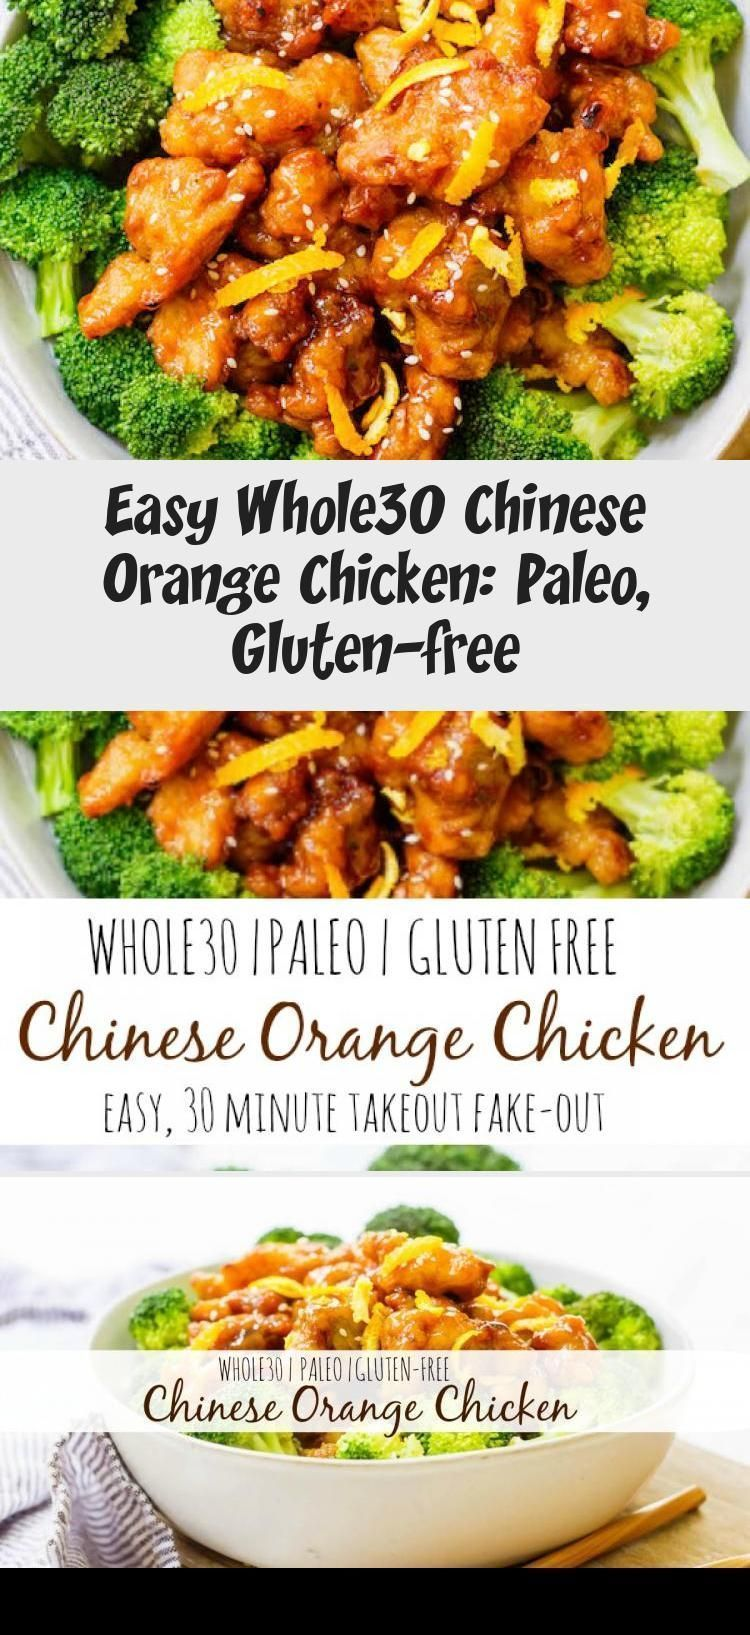 Apricot Chicken Gluten Free Dairy Free In 2020 Free Chicken Recipes Dairy Free Recipes Dinner Gluten Free Dairy Free Recipes